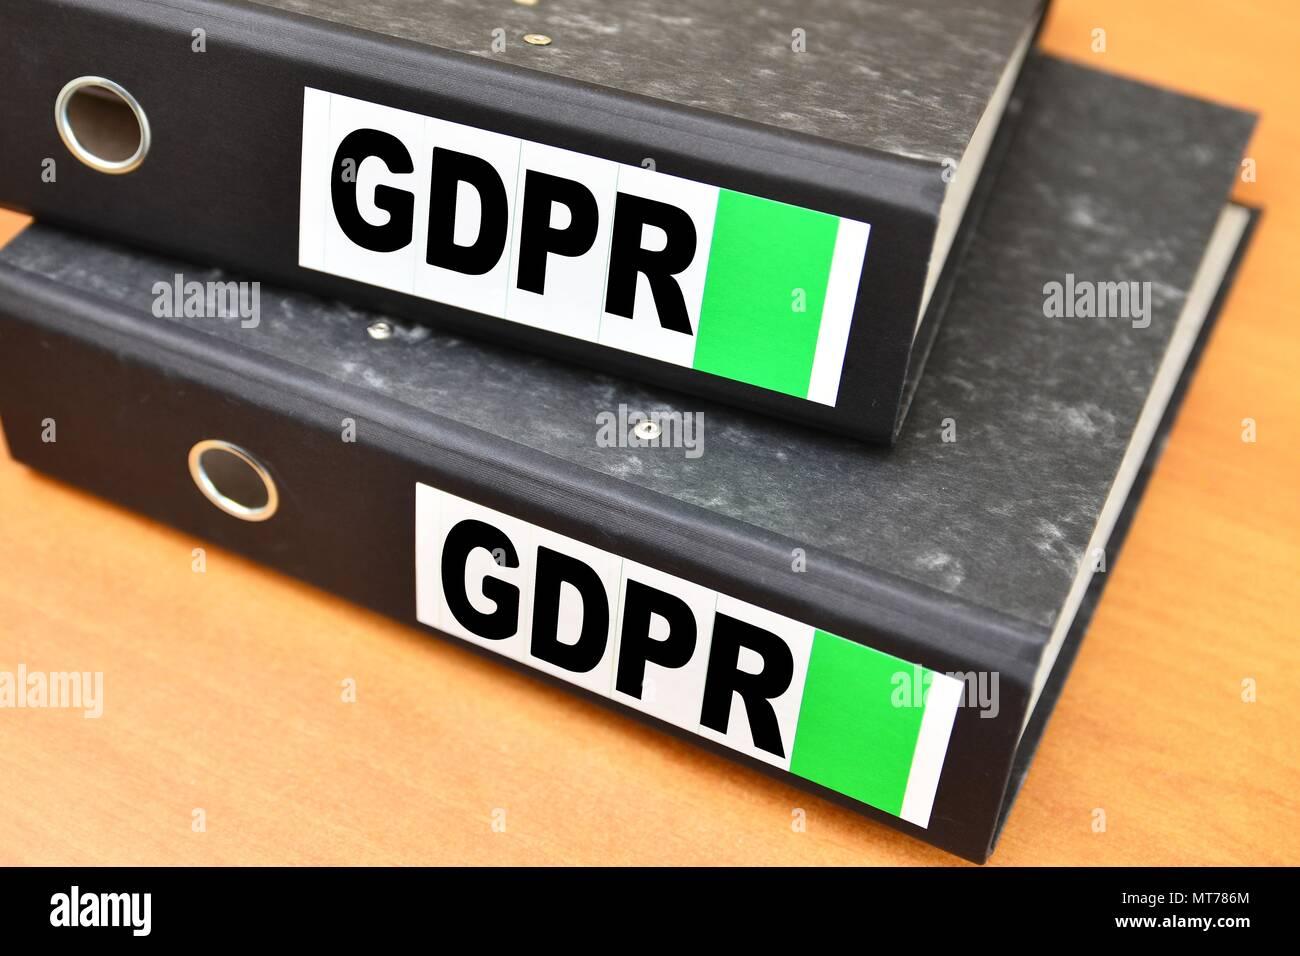 GDPR, General Data Protection Regulation, file, files - Stock Image